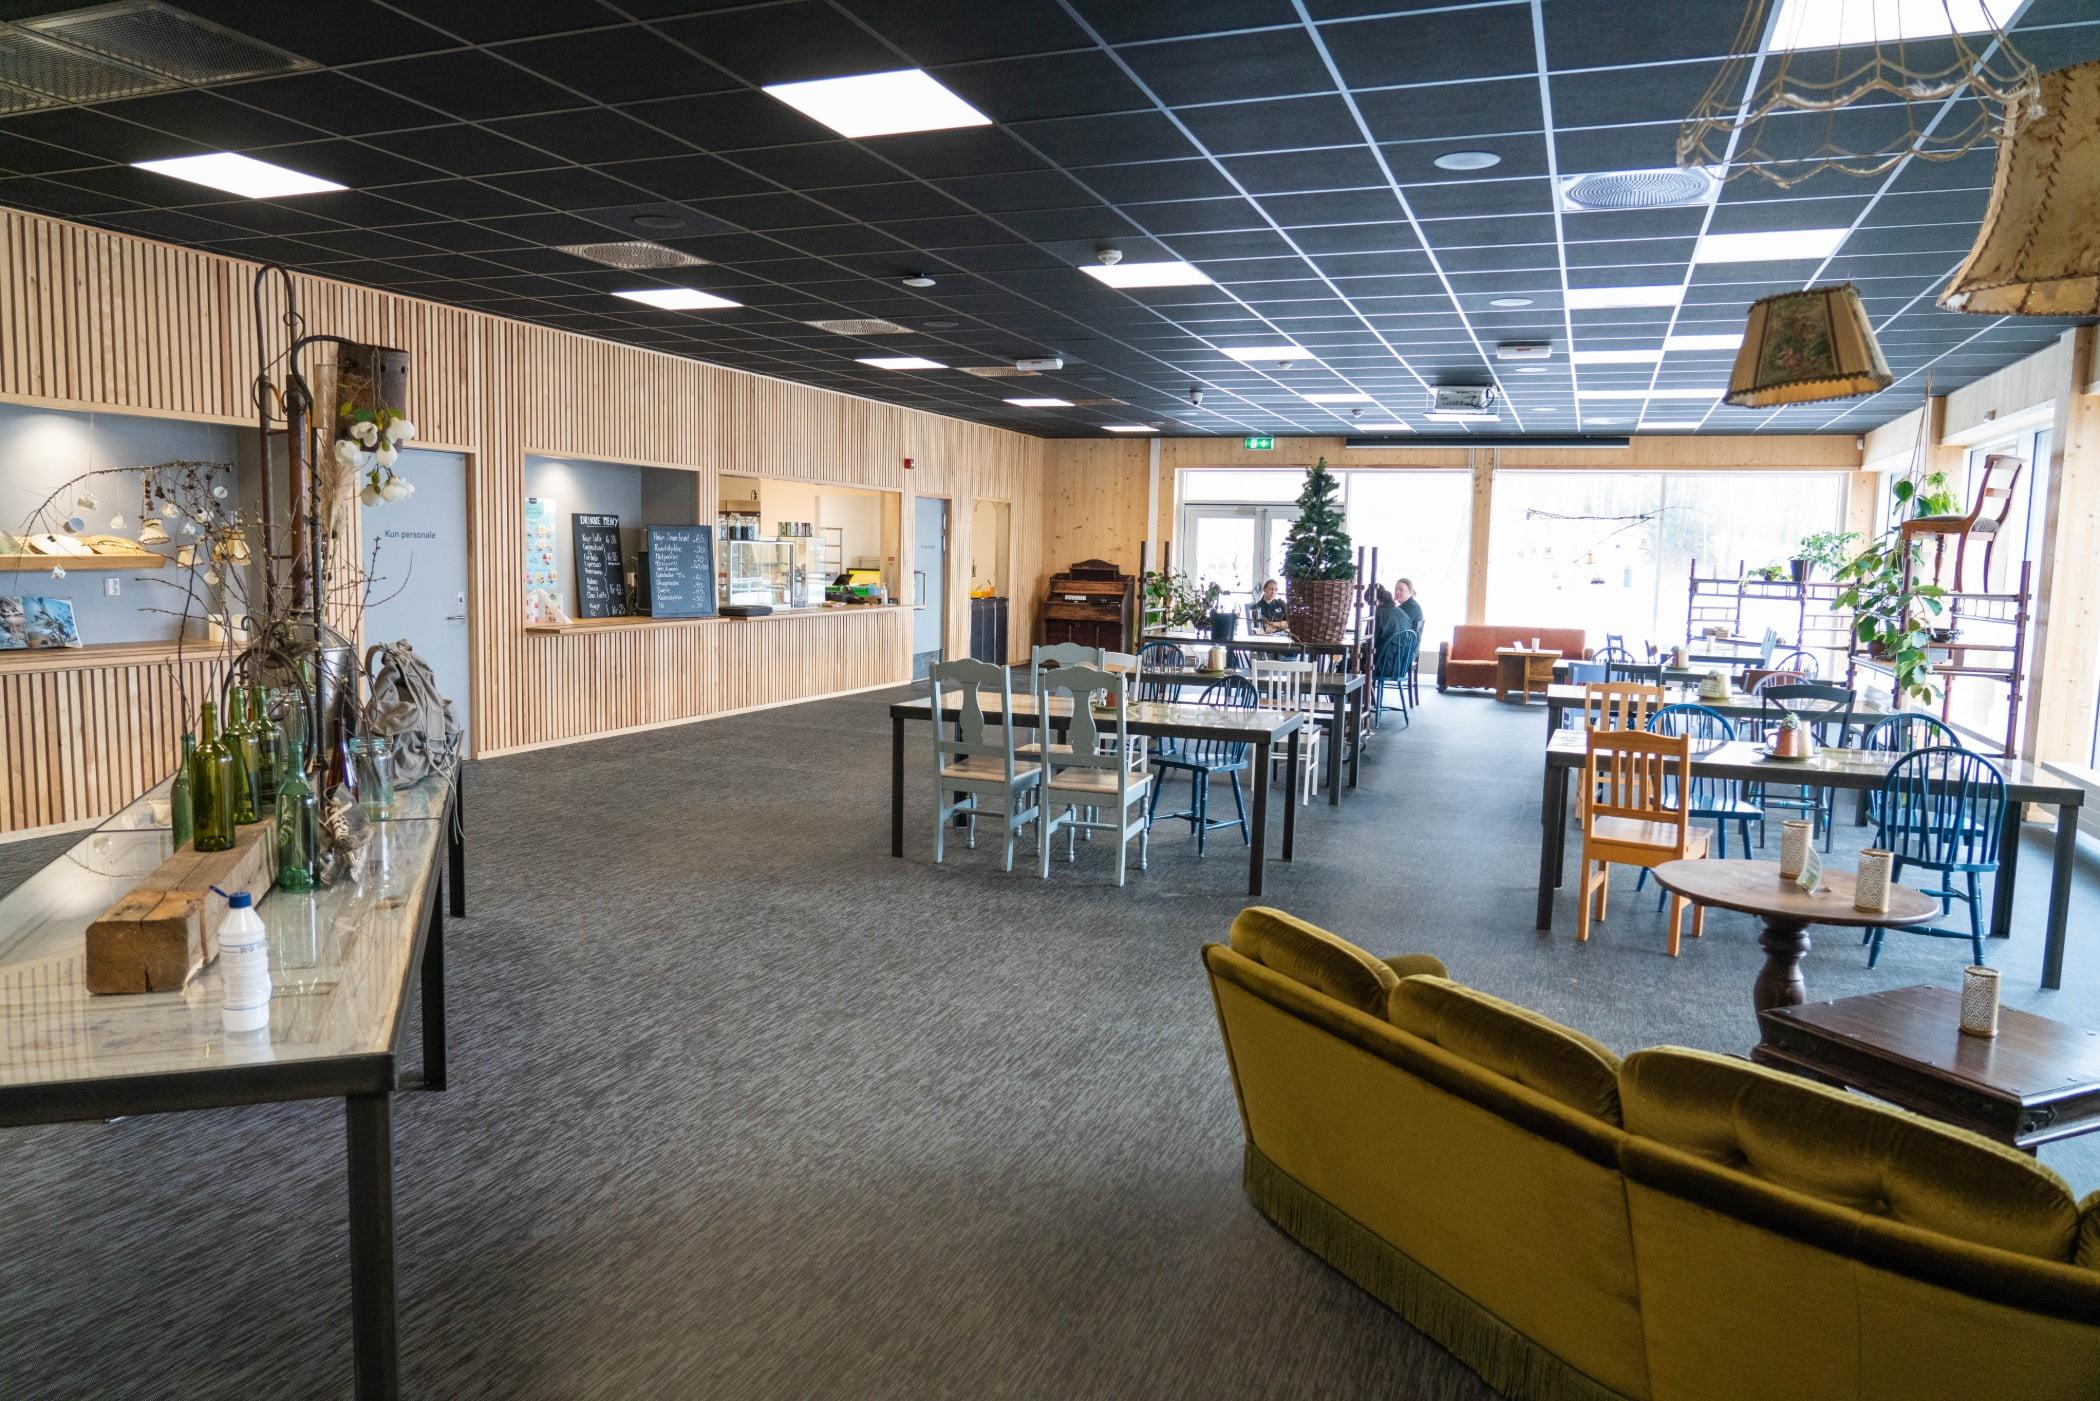 Interior design, Furniture, Table, Chair, Plant, Architecture, Flooring, Floor, Bookcase, Building